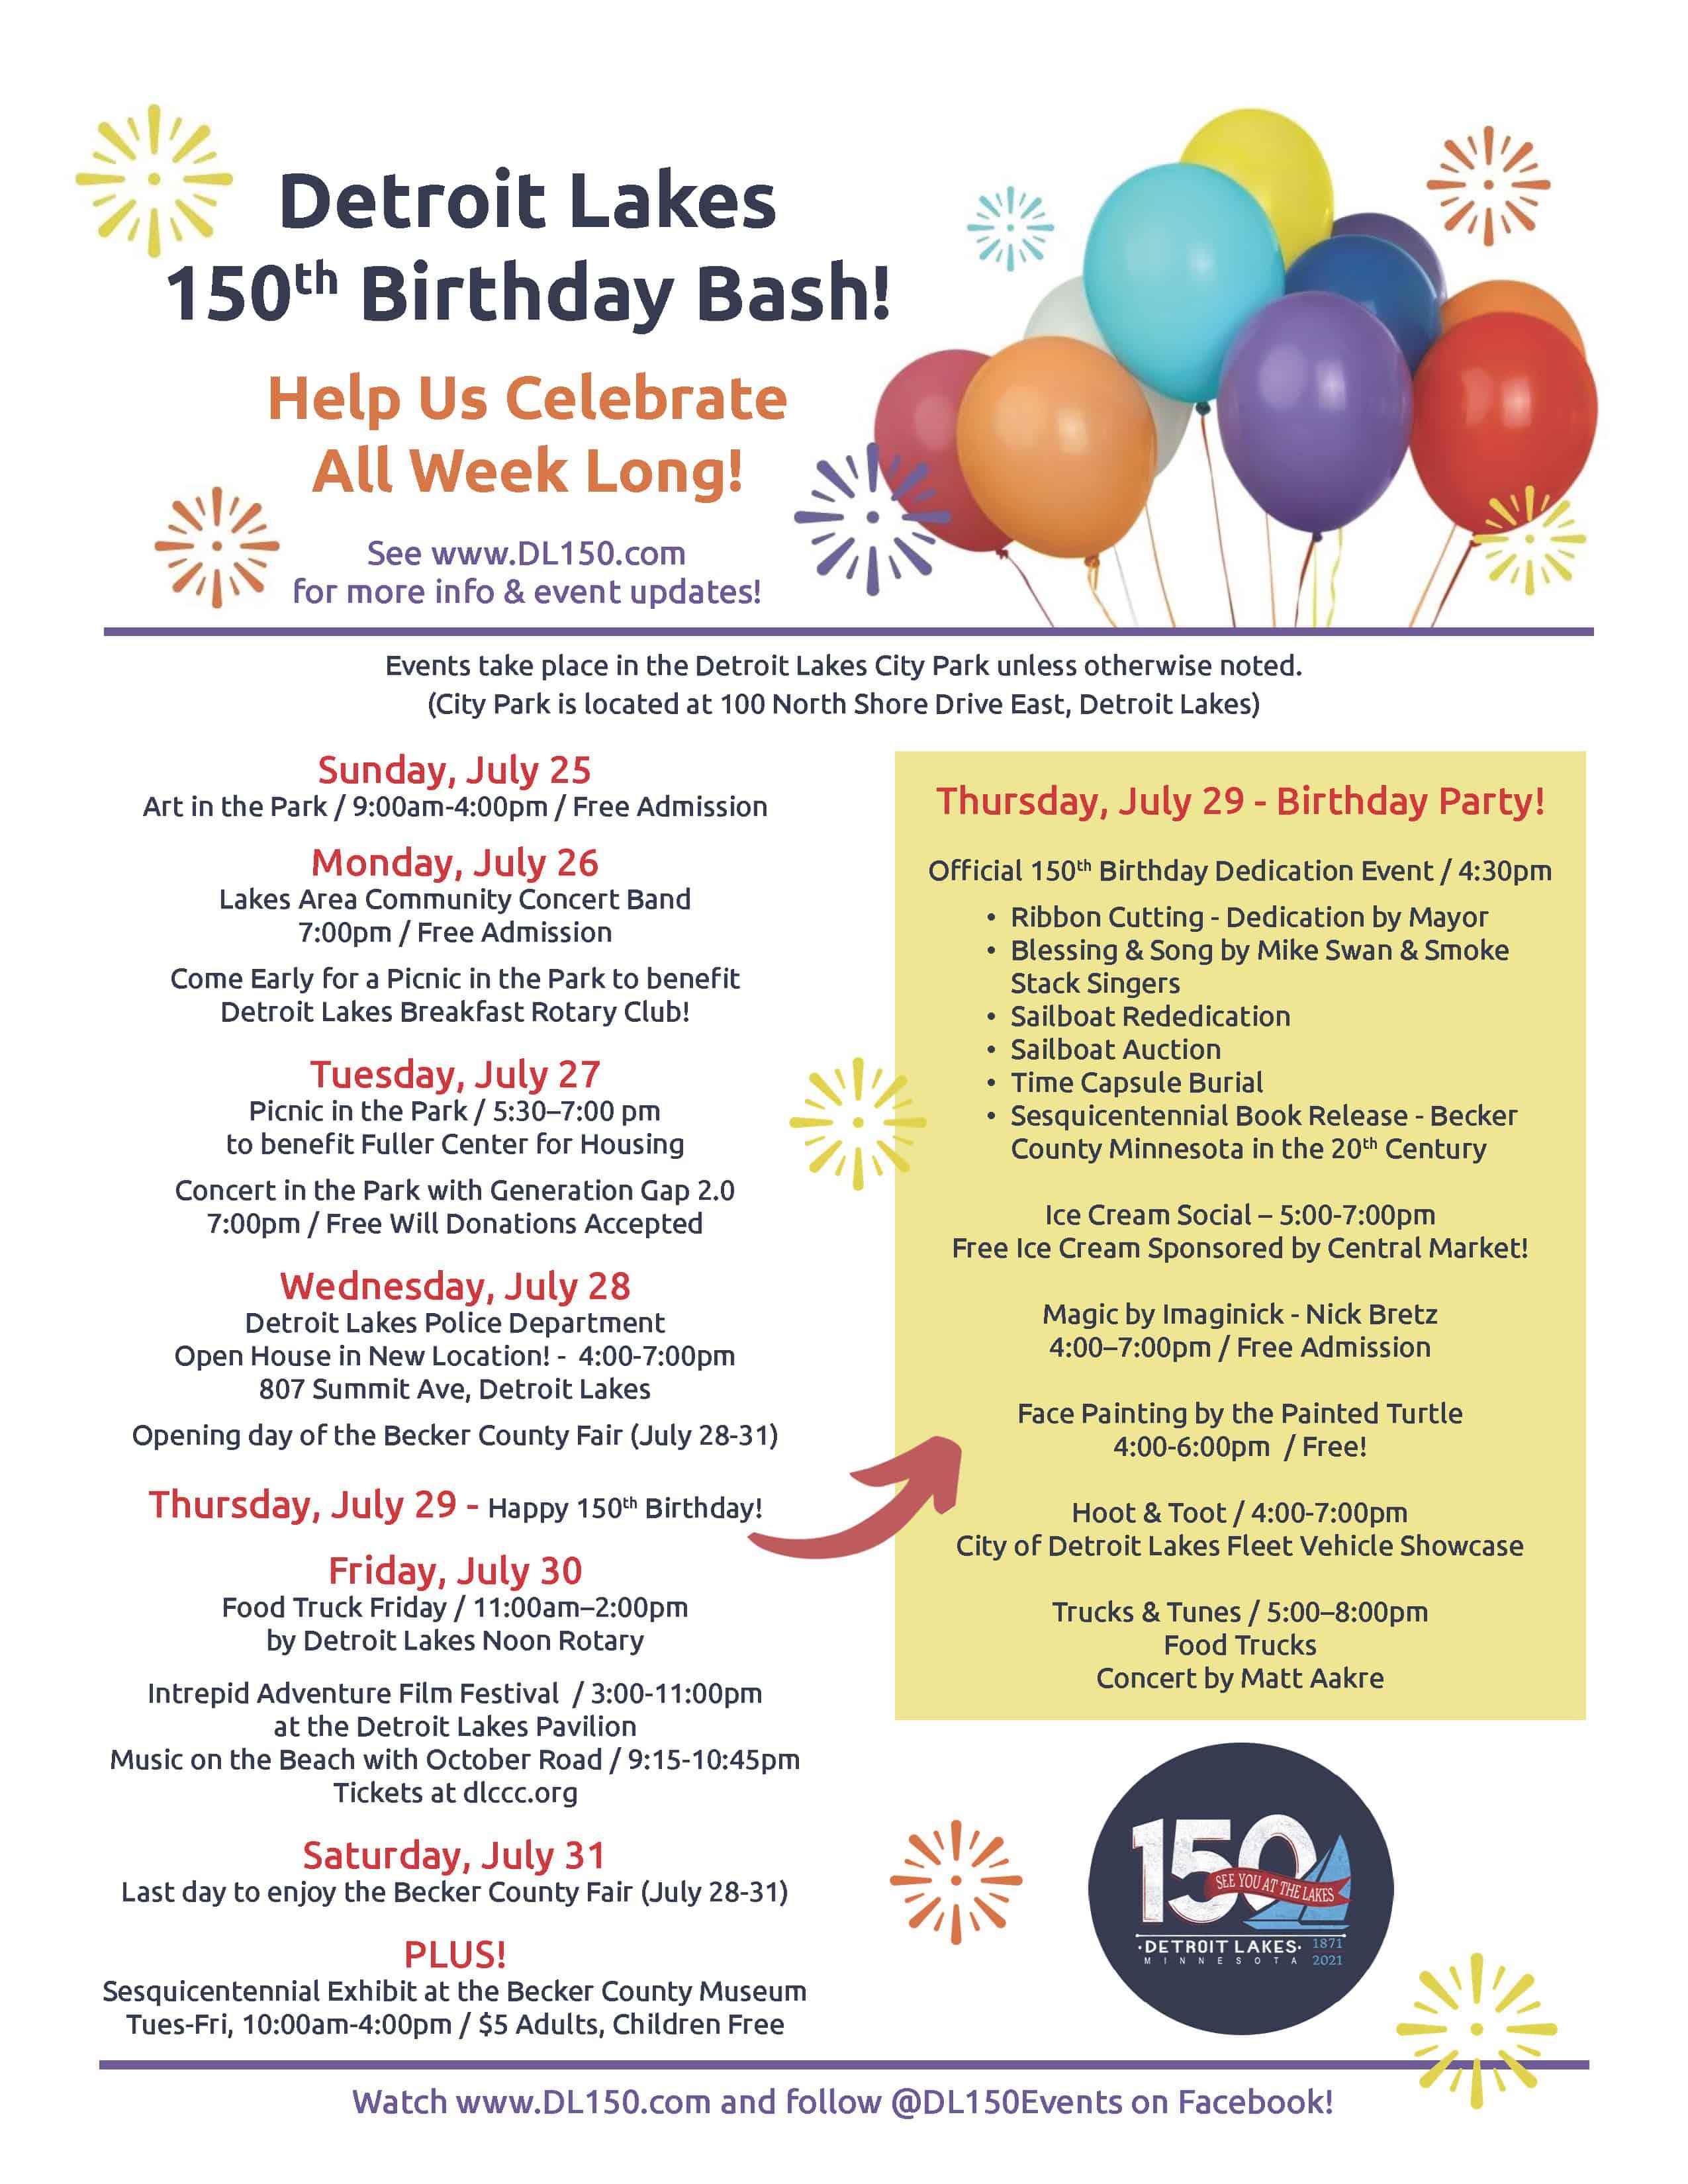 Detroit Lakes Birthday Bash Final Flyer [07-07-21]